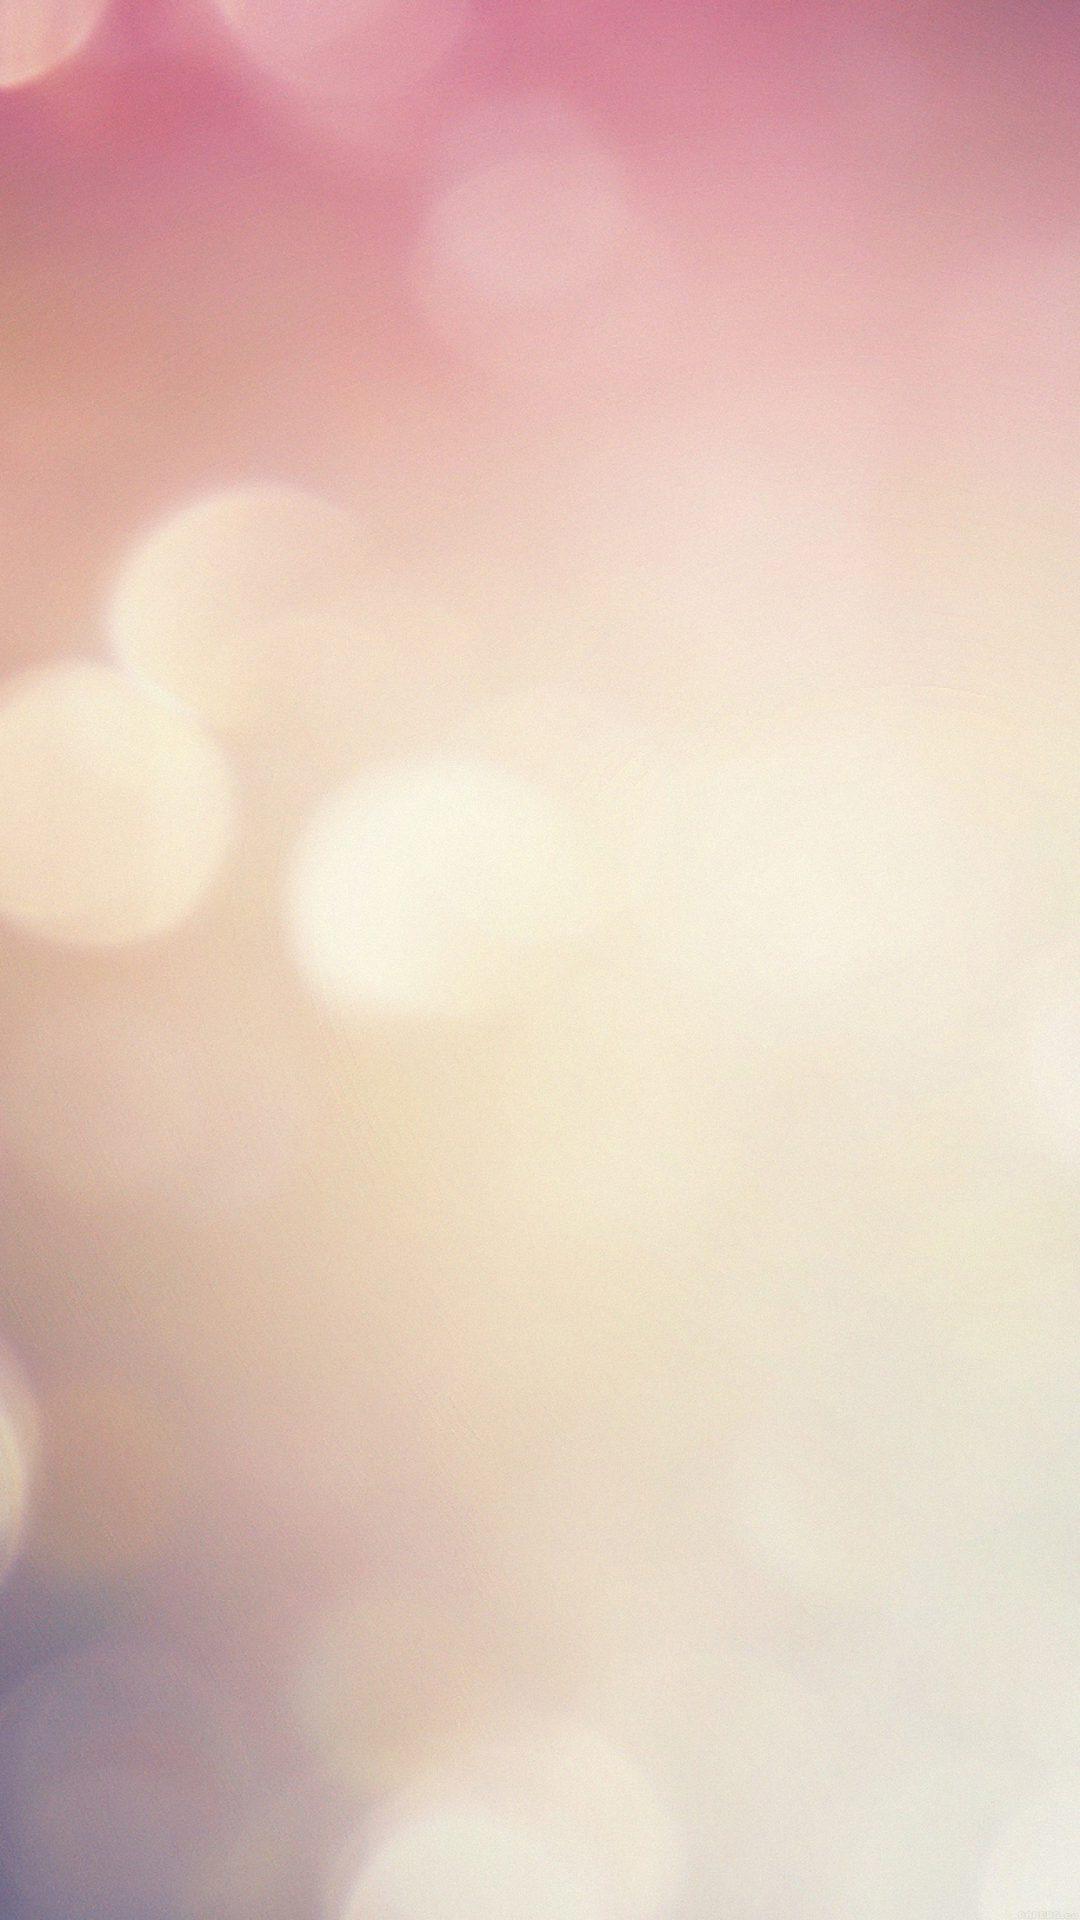 Winter Bokeh Shiny Lights Gradation Blur